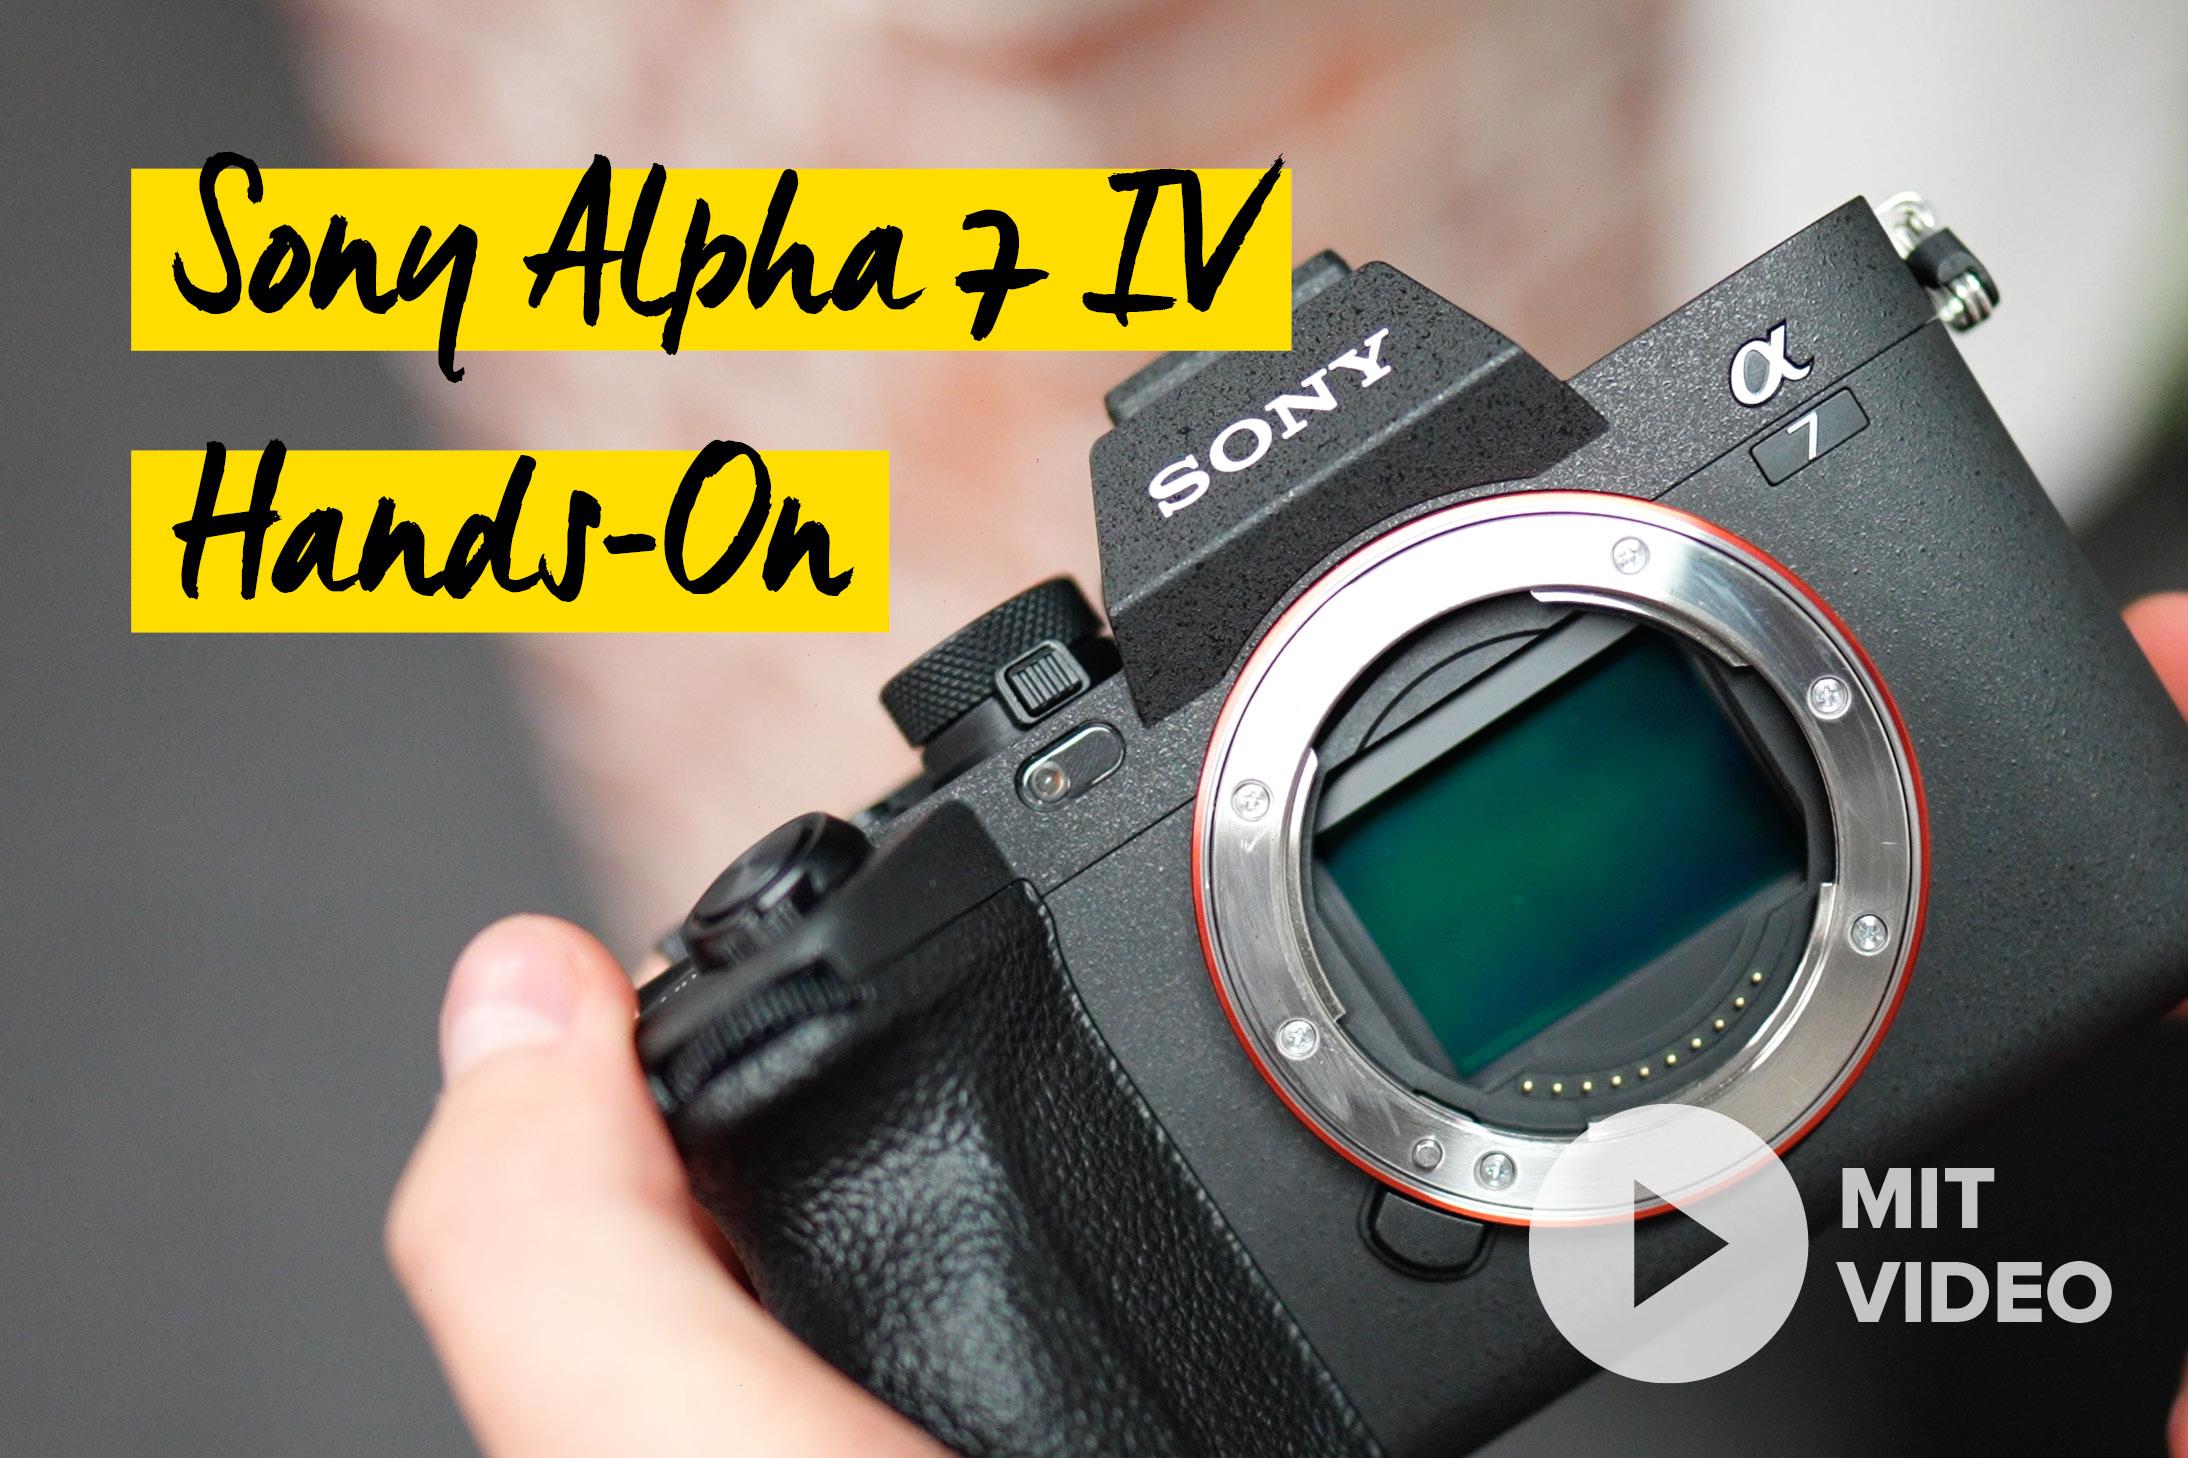 Sony Alpha 7 IV im Hands-On Test